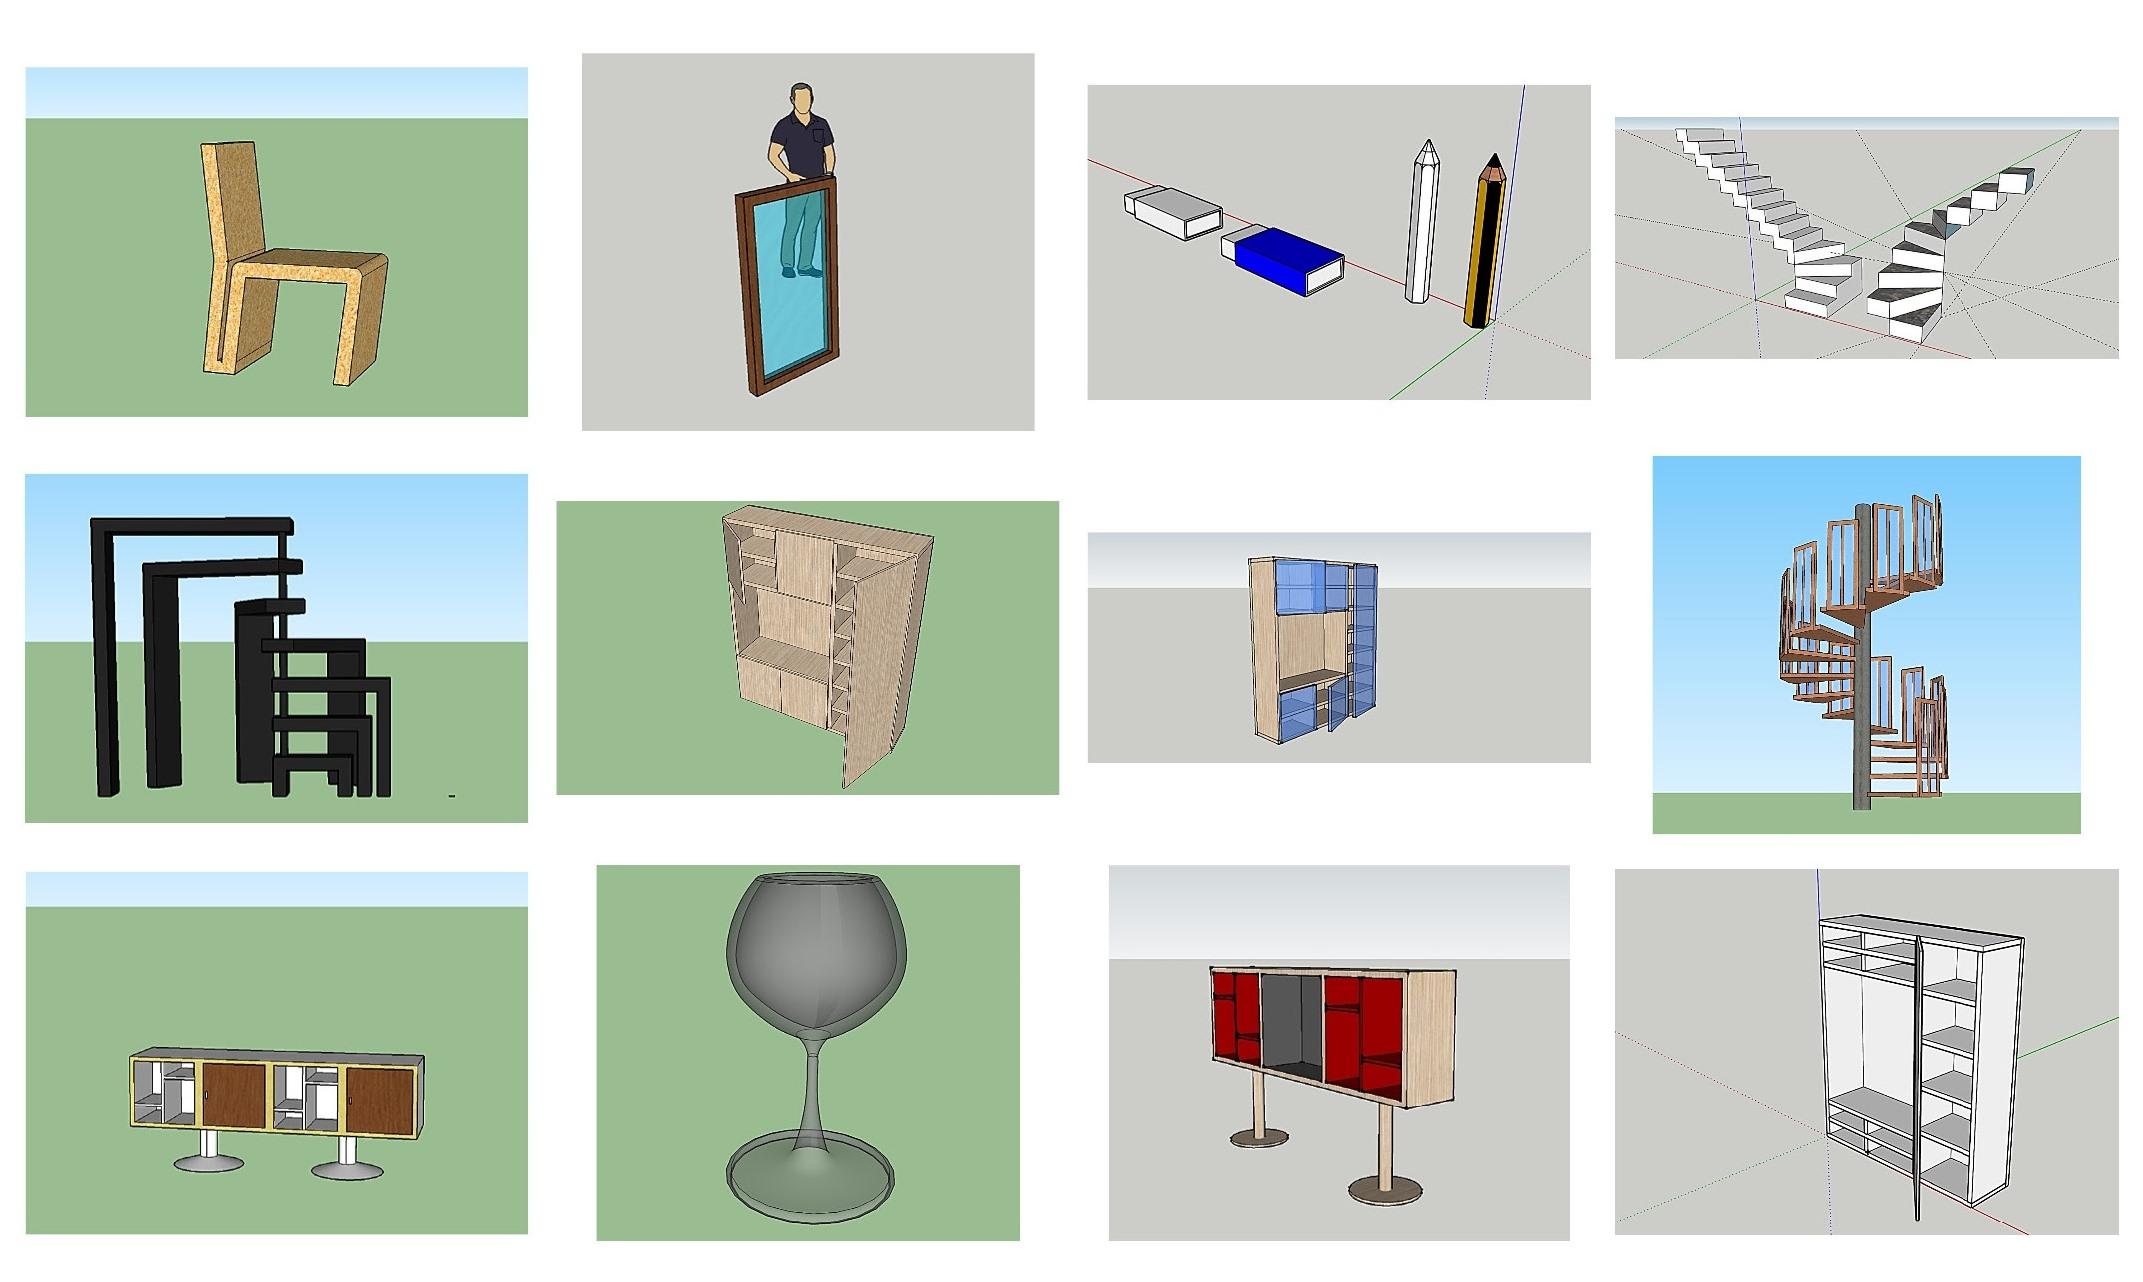 2020.06-LabDesign-DaD-prof.-F.-Brunetti-4Dha-5Dha-modelli-digitali-1